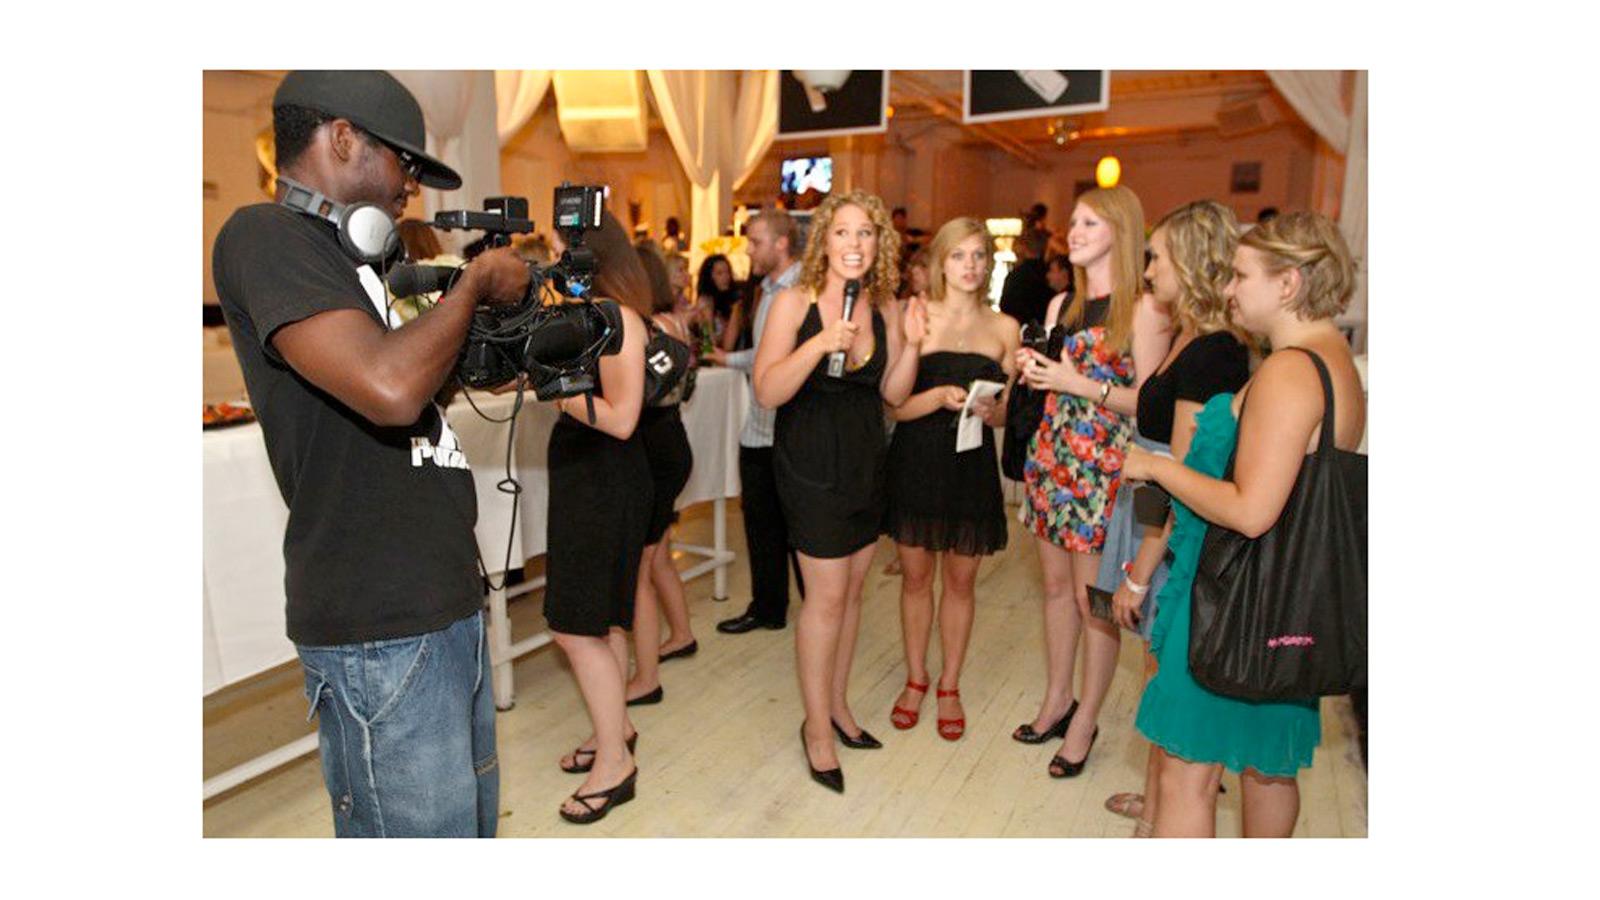 John Frieda | Sheer Blonde | Digital Marketing, Experiential, Social Media